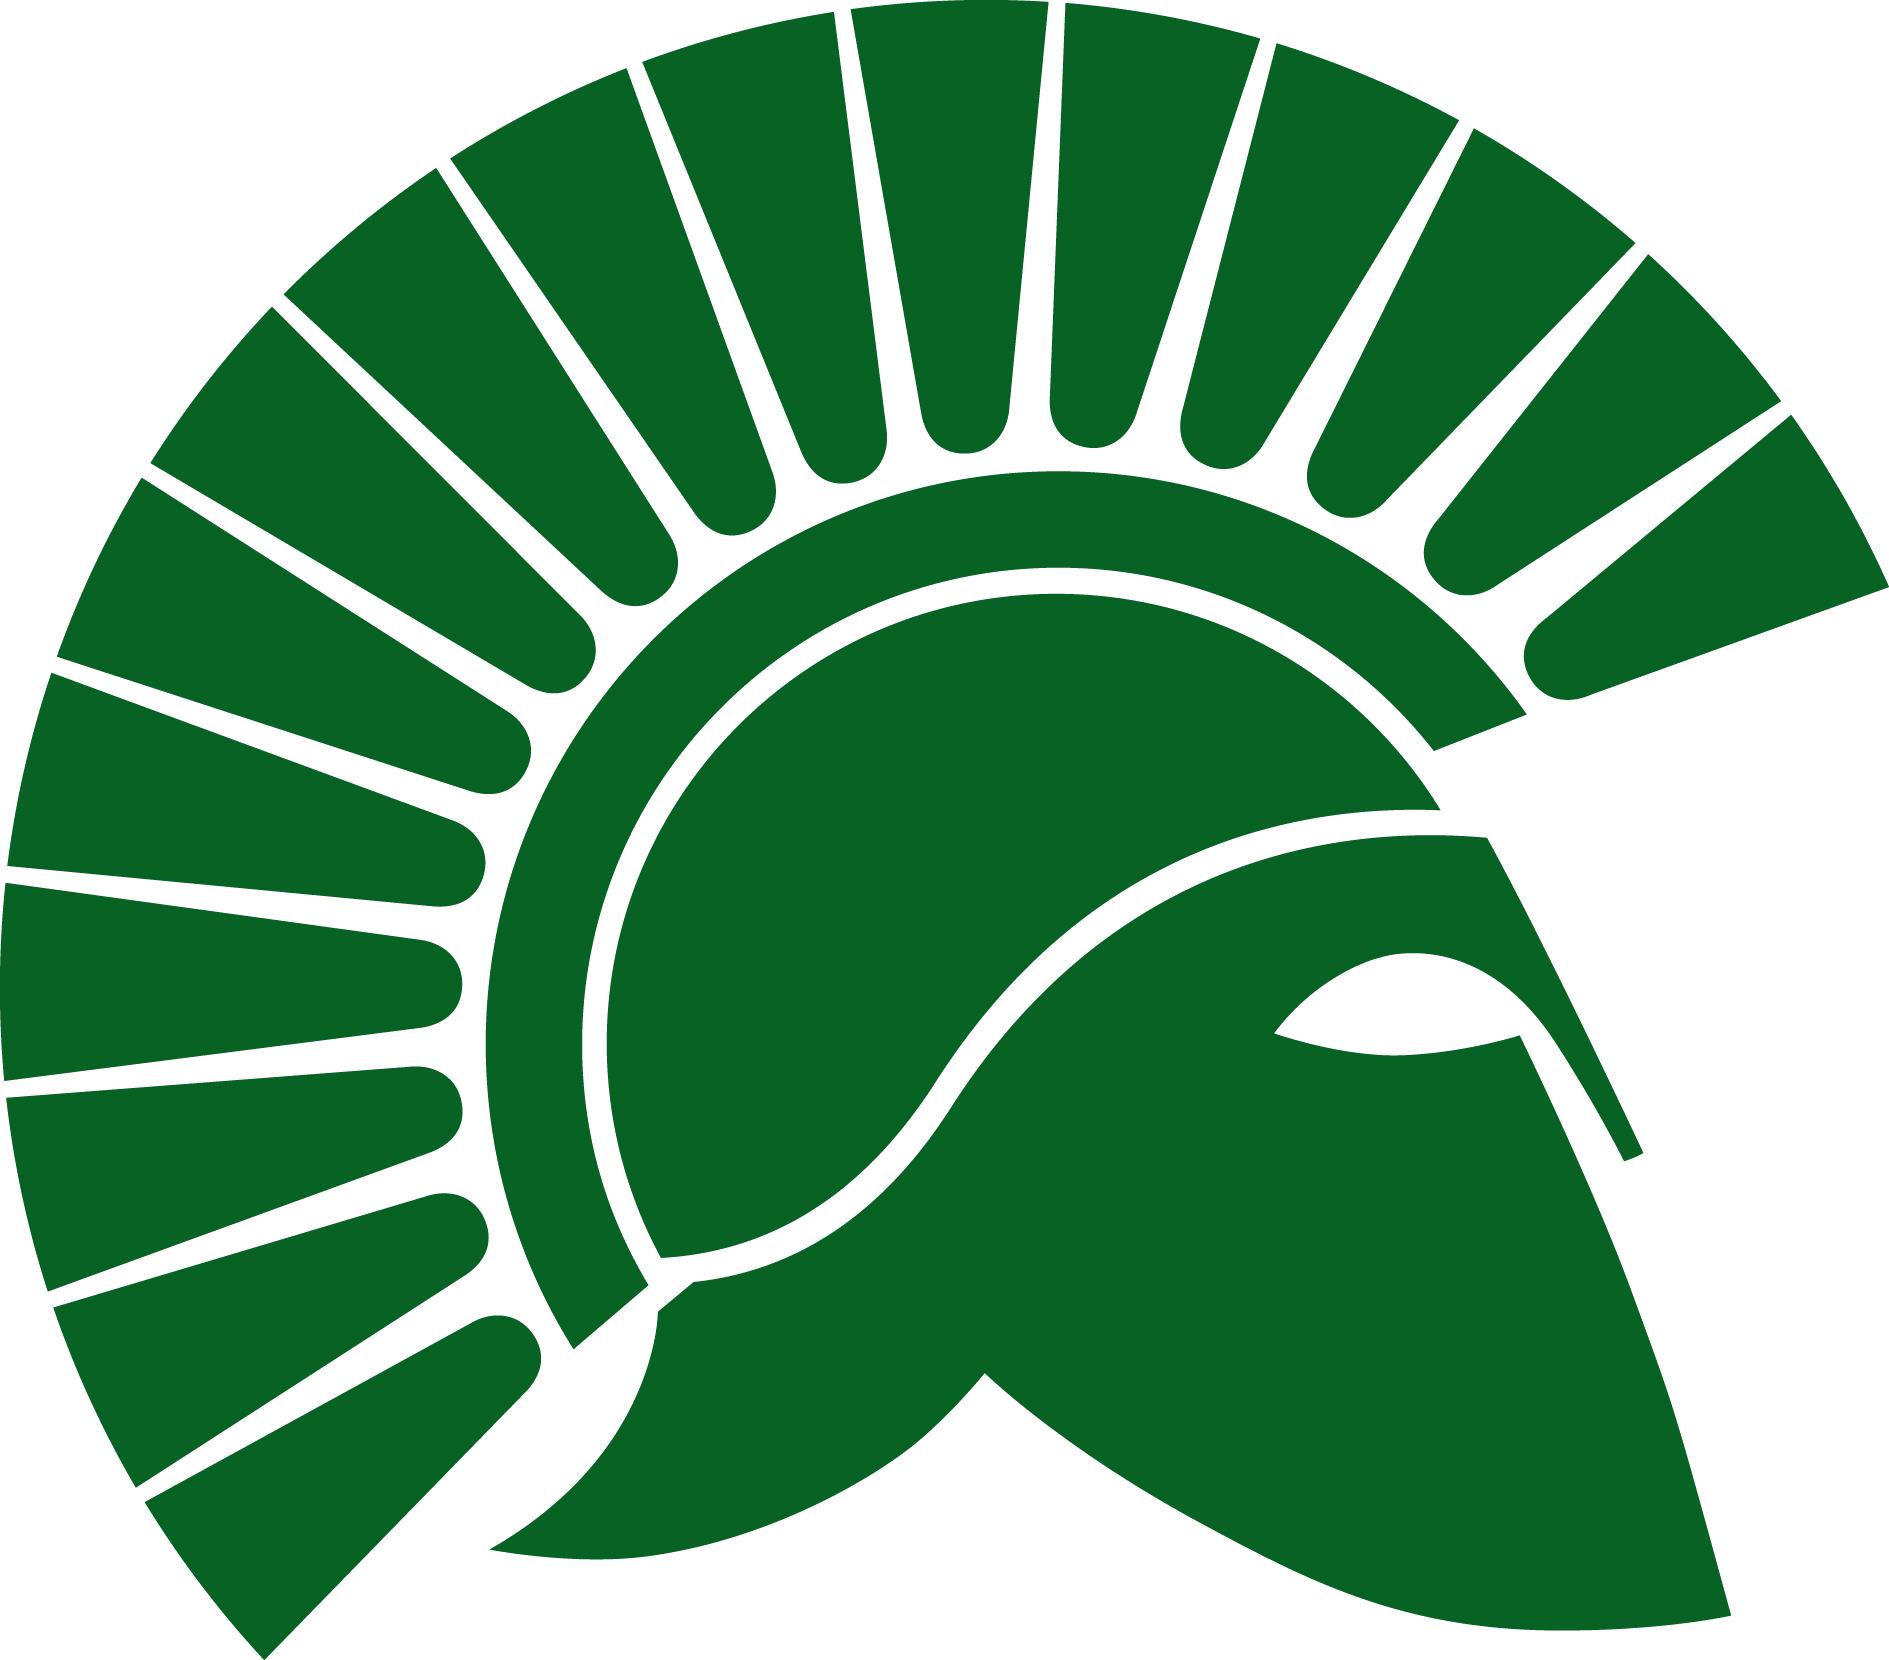 De La Salle High School logo